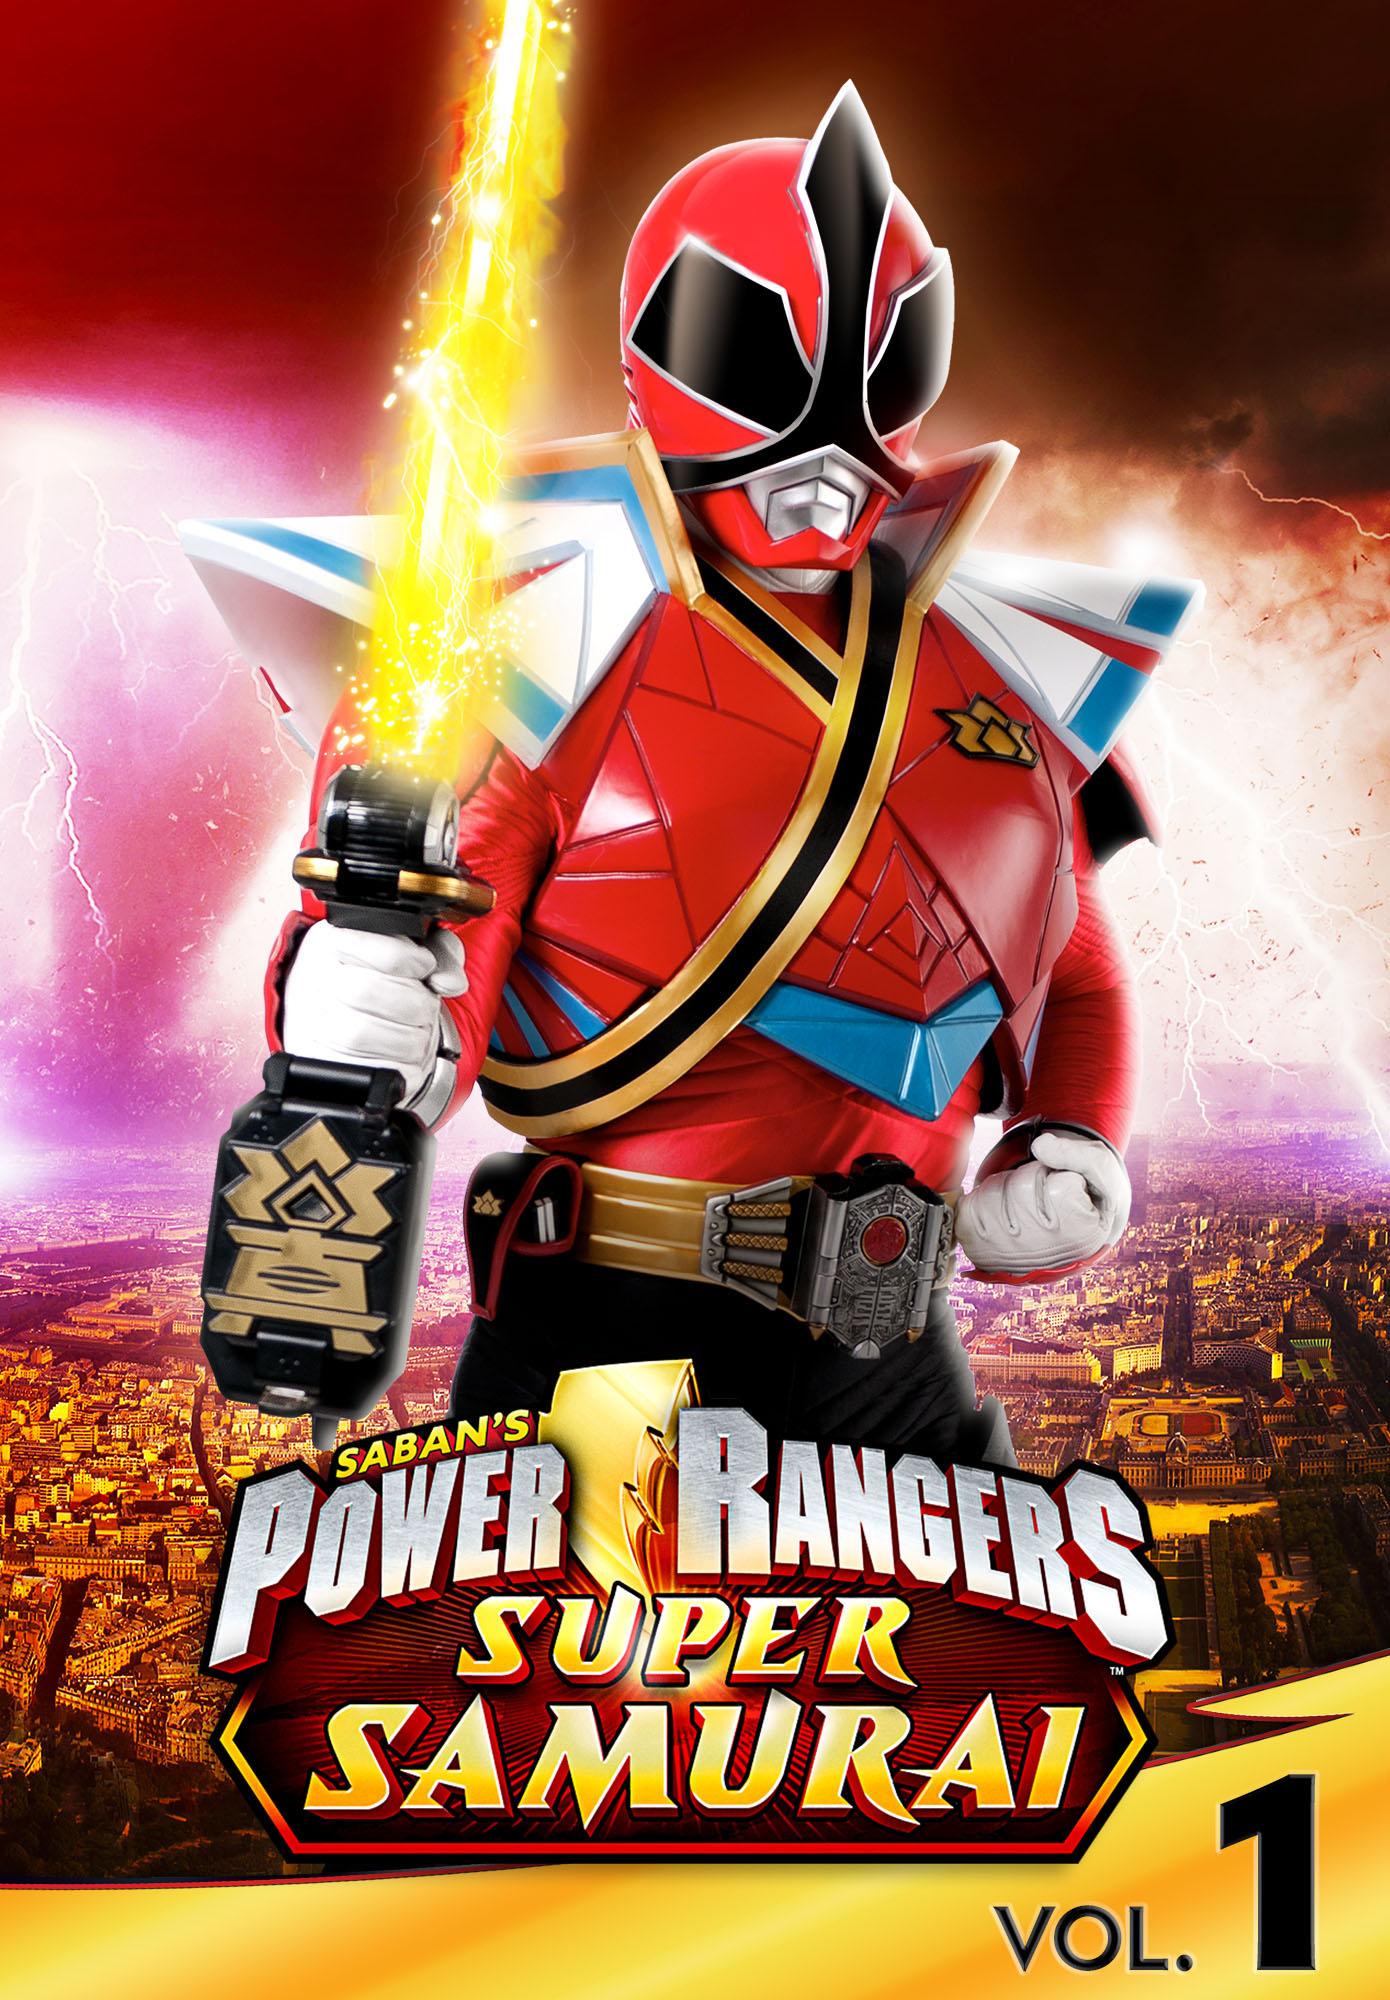 Power Rangers: Super Samurai - Volume 1 - The Super Powered Black Box